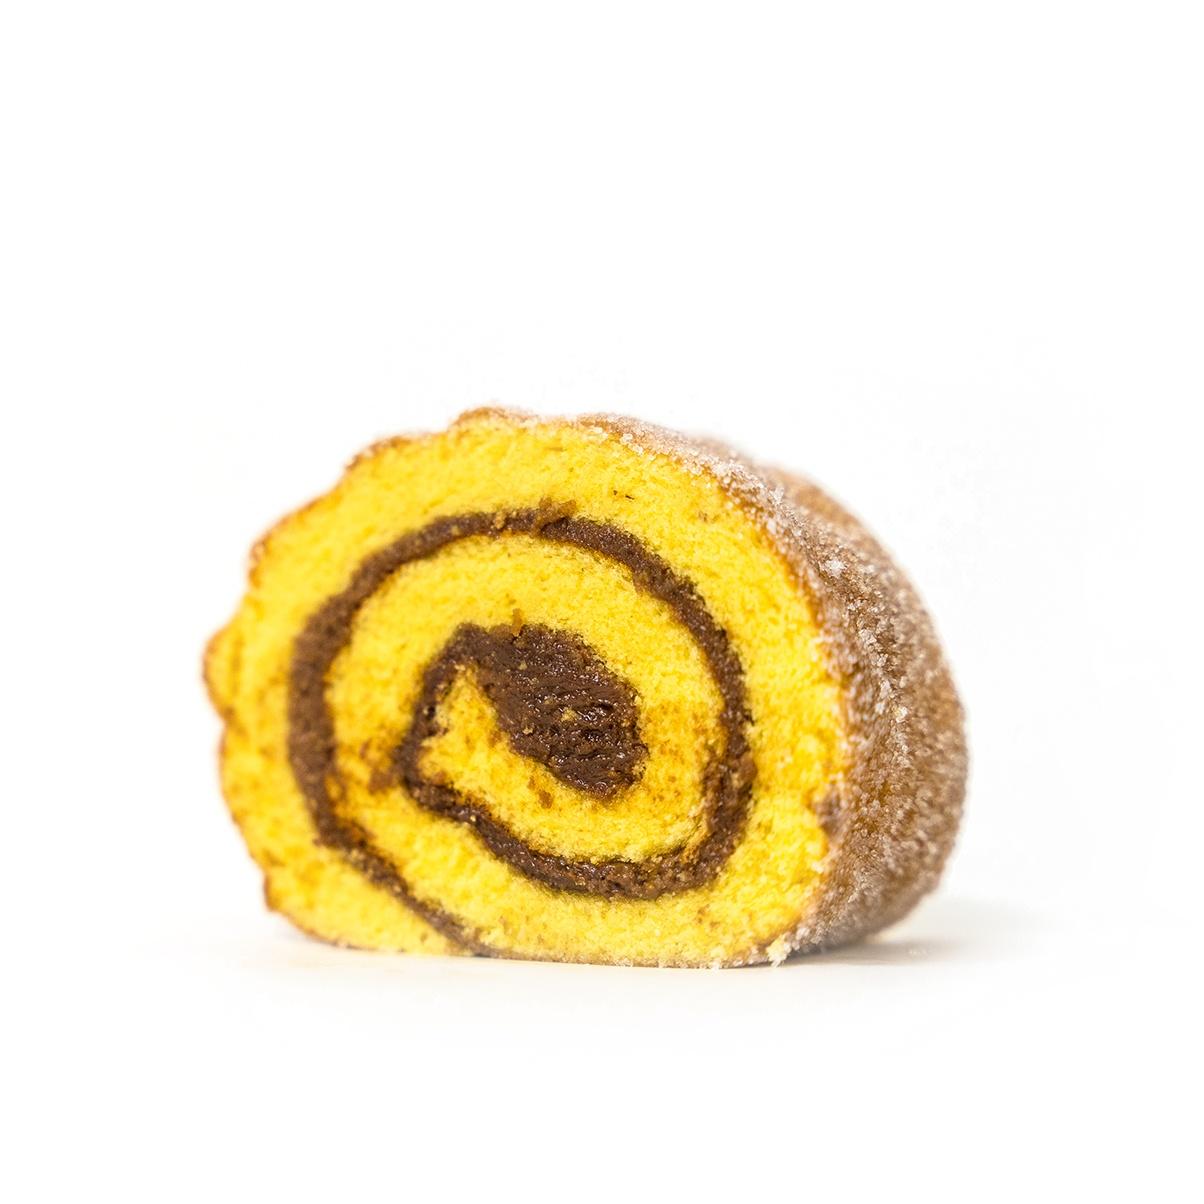 torta-chocolate-pastelaria-fresca-entrega-casa-cale-confeitaria-tradicional-portuguesa-peniche-caldas-rainha-padaria-pastelaria